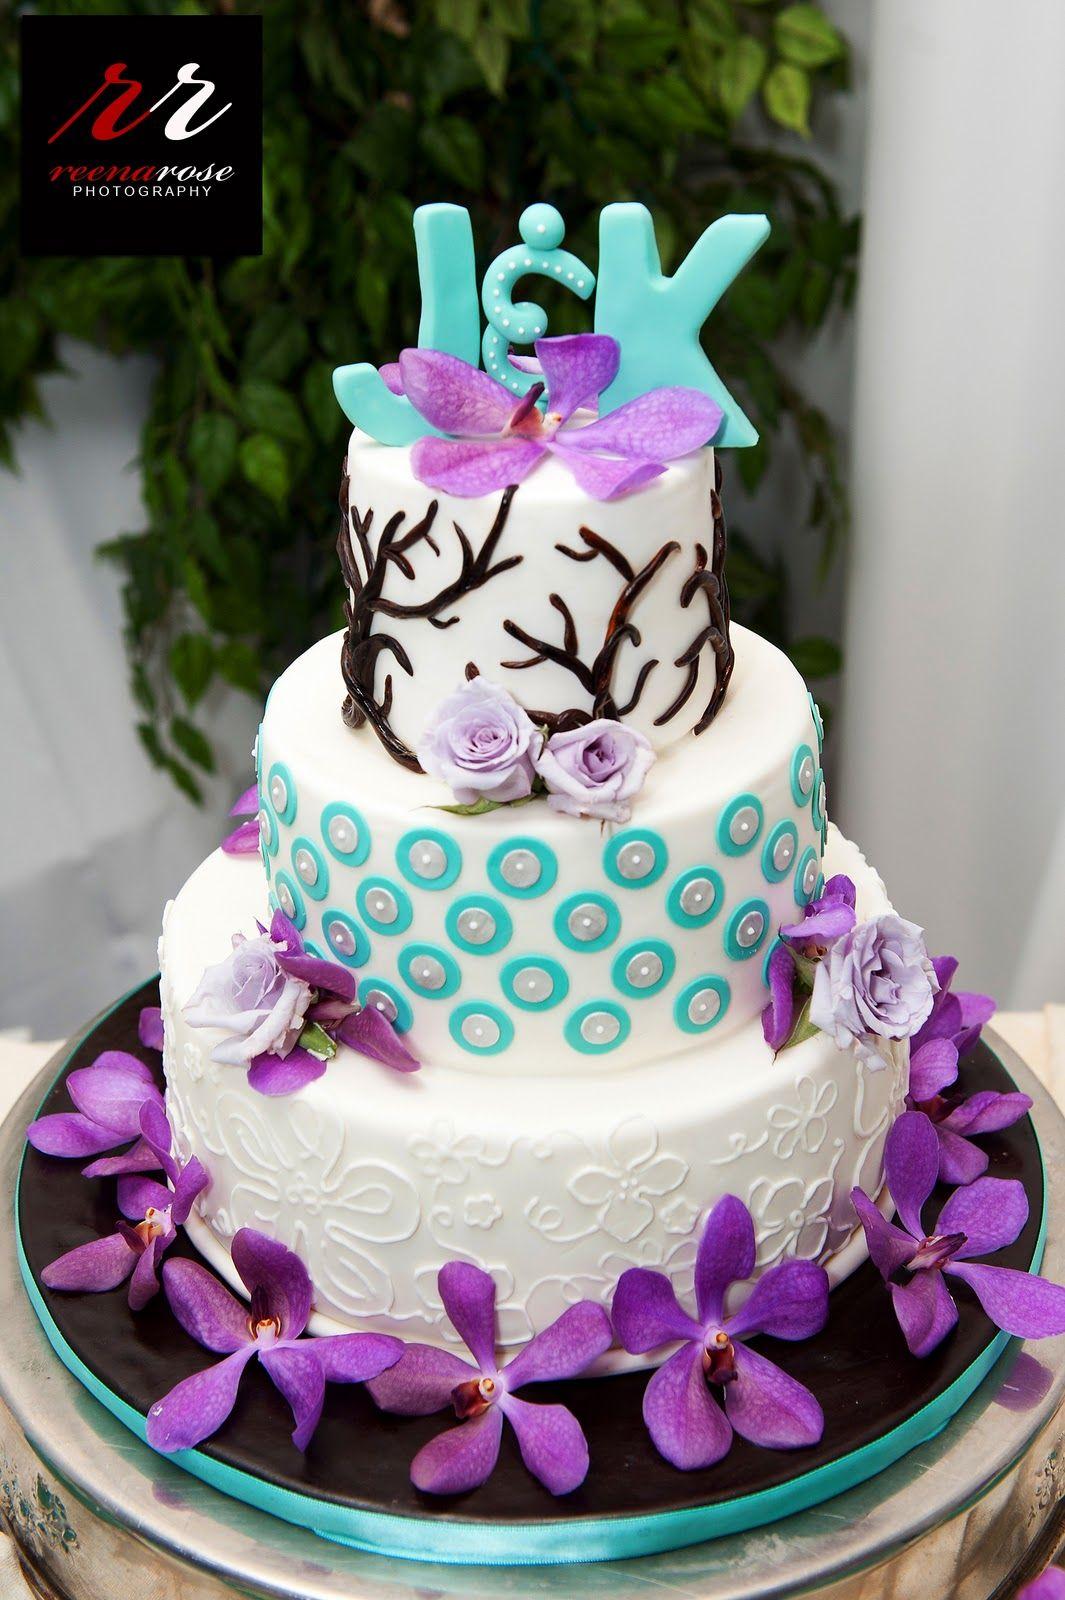 Wedding Decorations Orange Purple Turquoise Cake Reference For